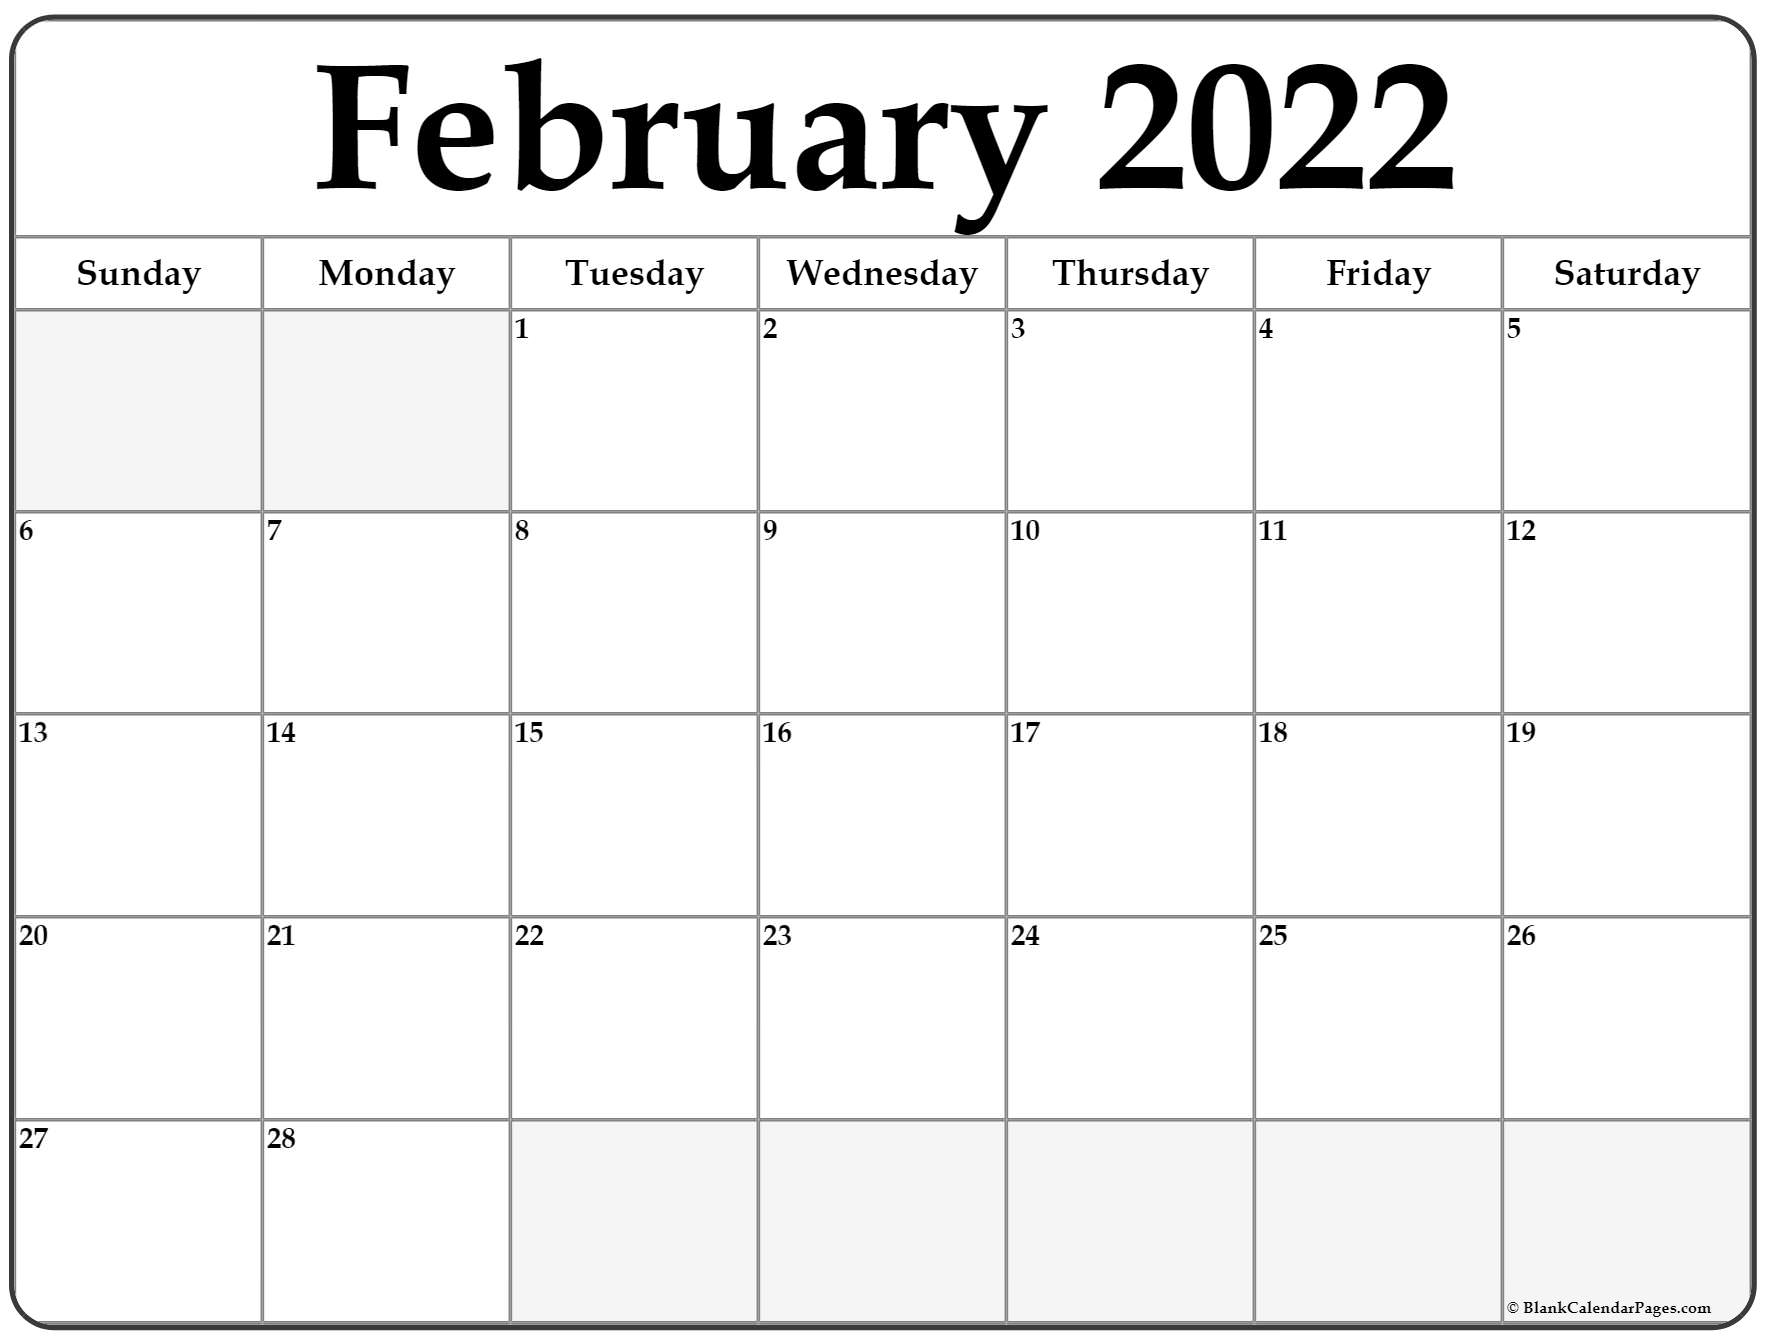 February 2022 Calendar | Free Printable Calendar Templates With Regard To Blank Calendar April 2022 Printable February